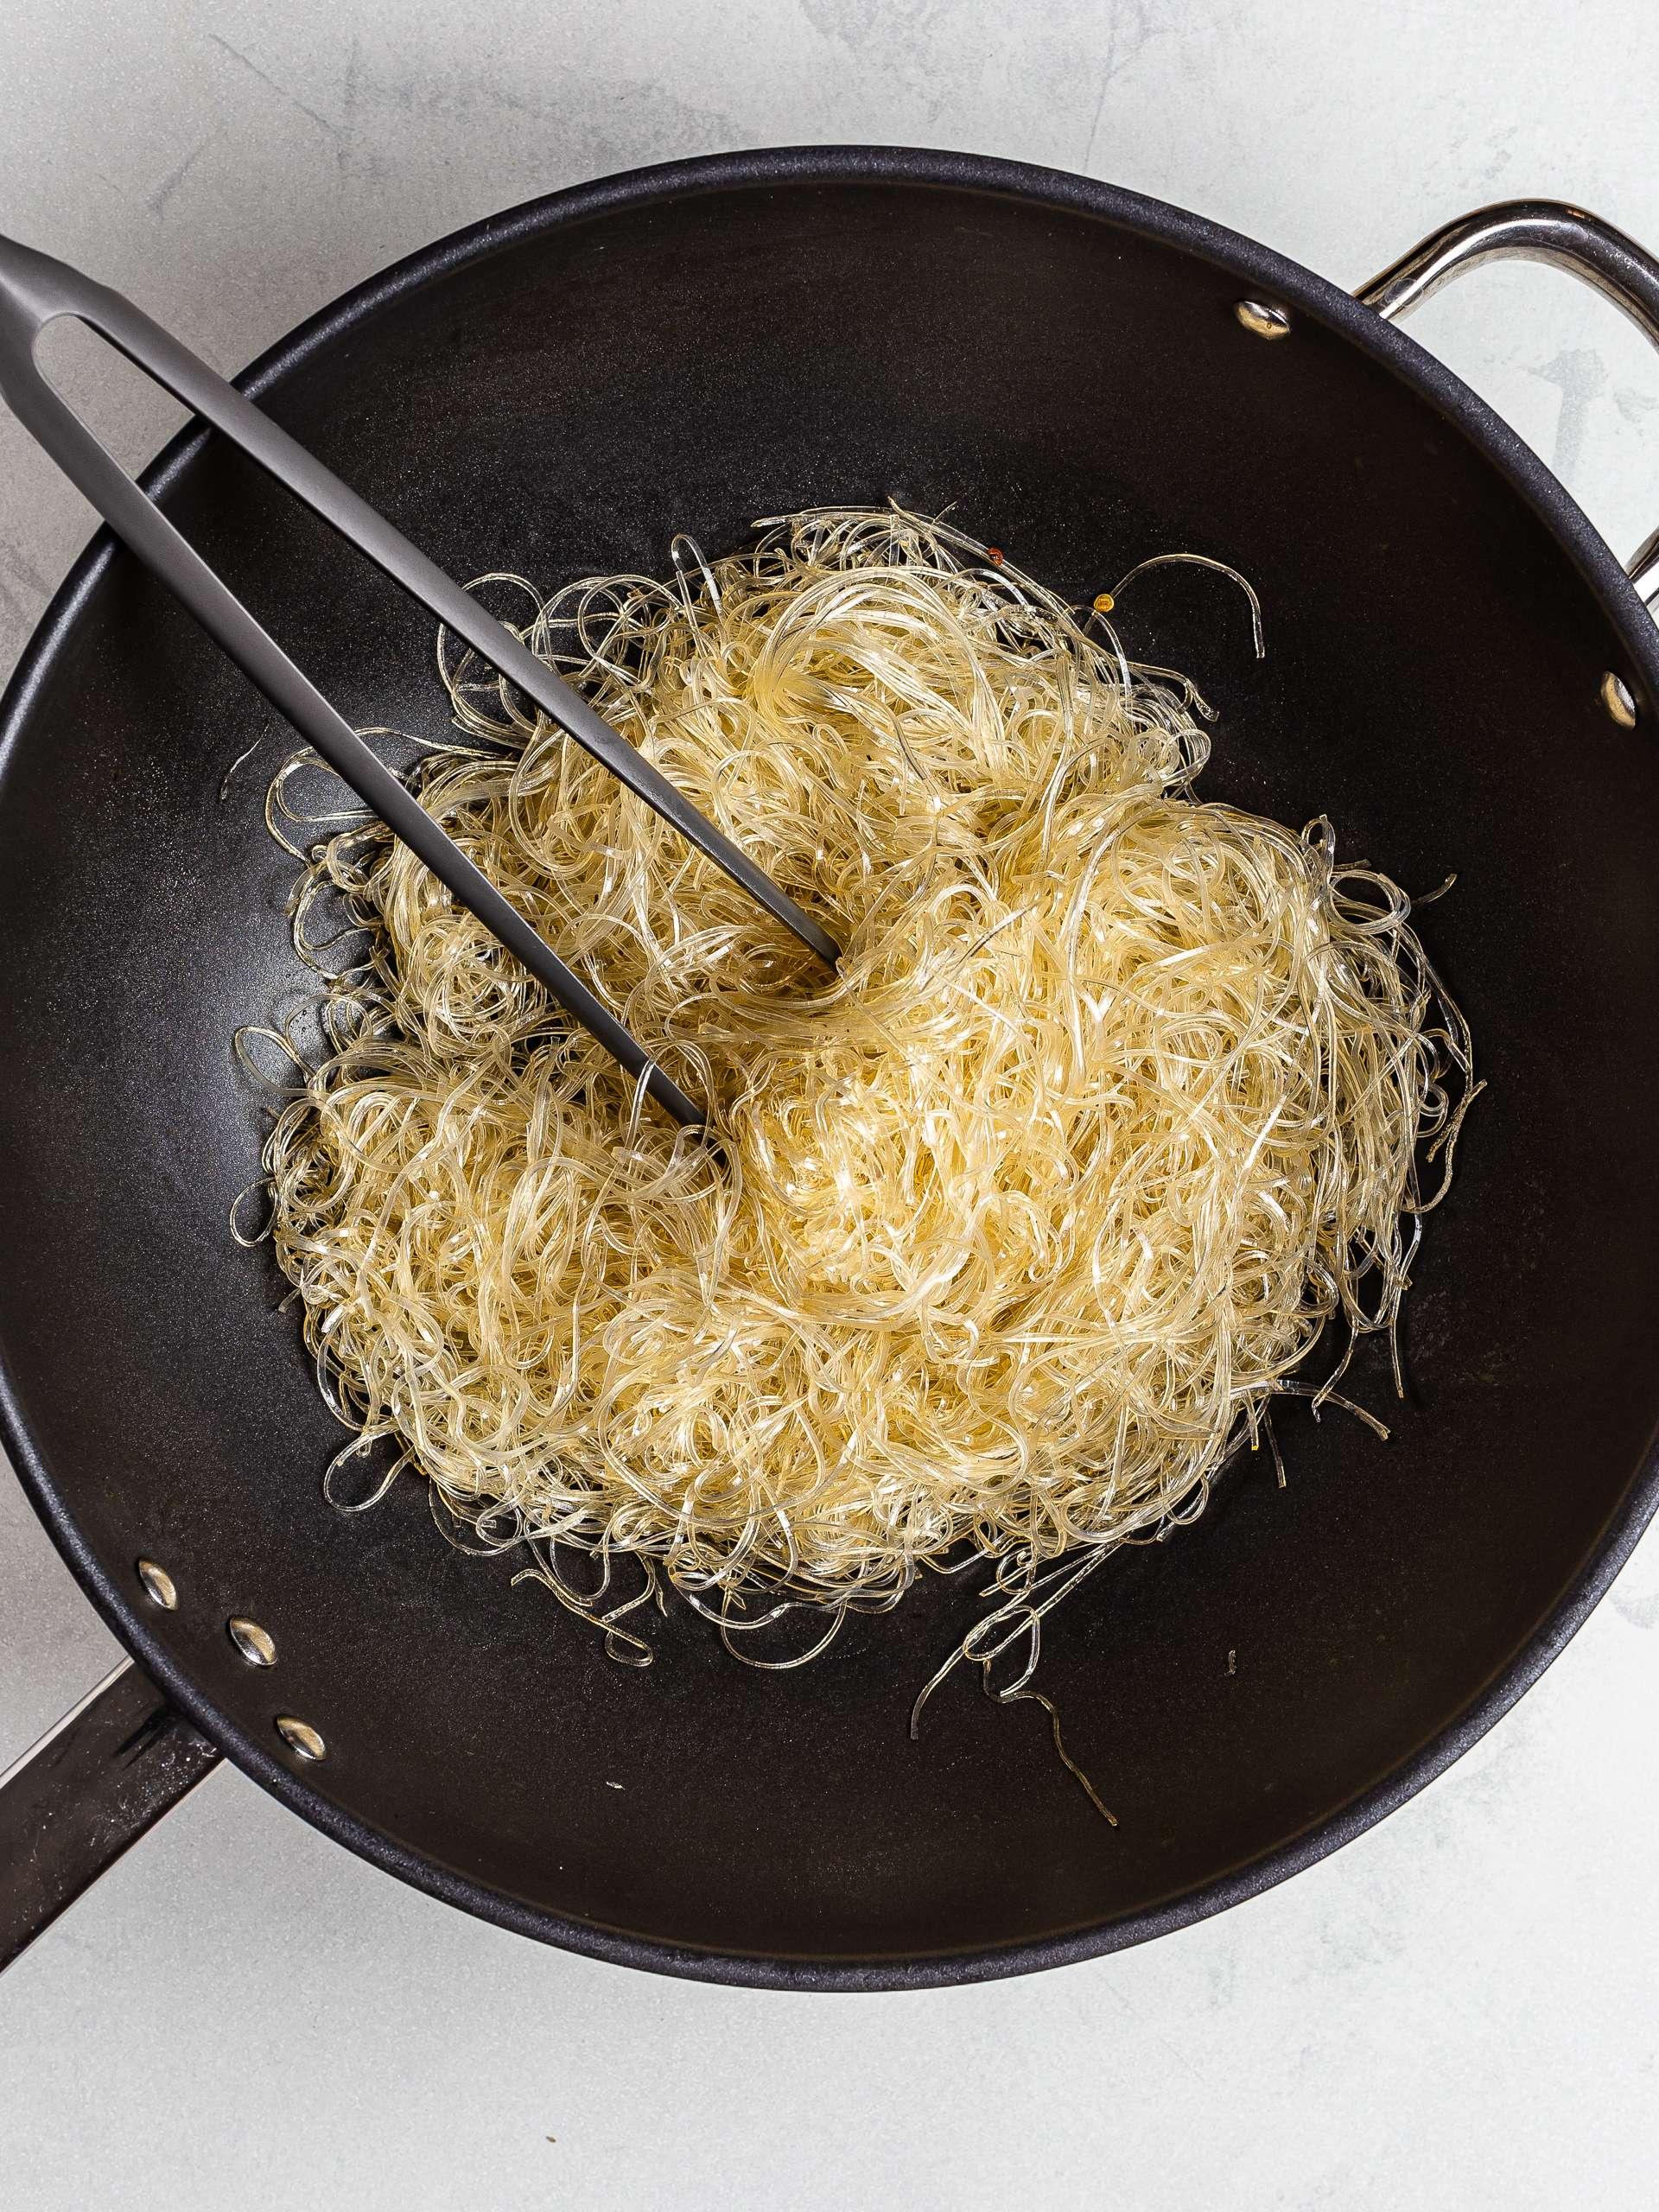 Glass noodles stir fried in a wok